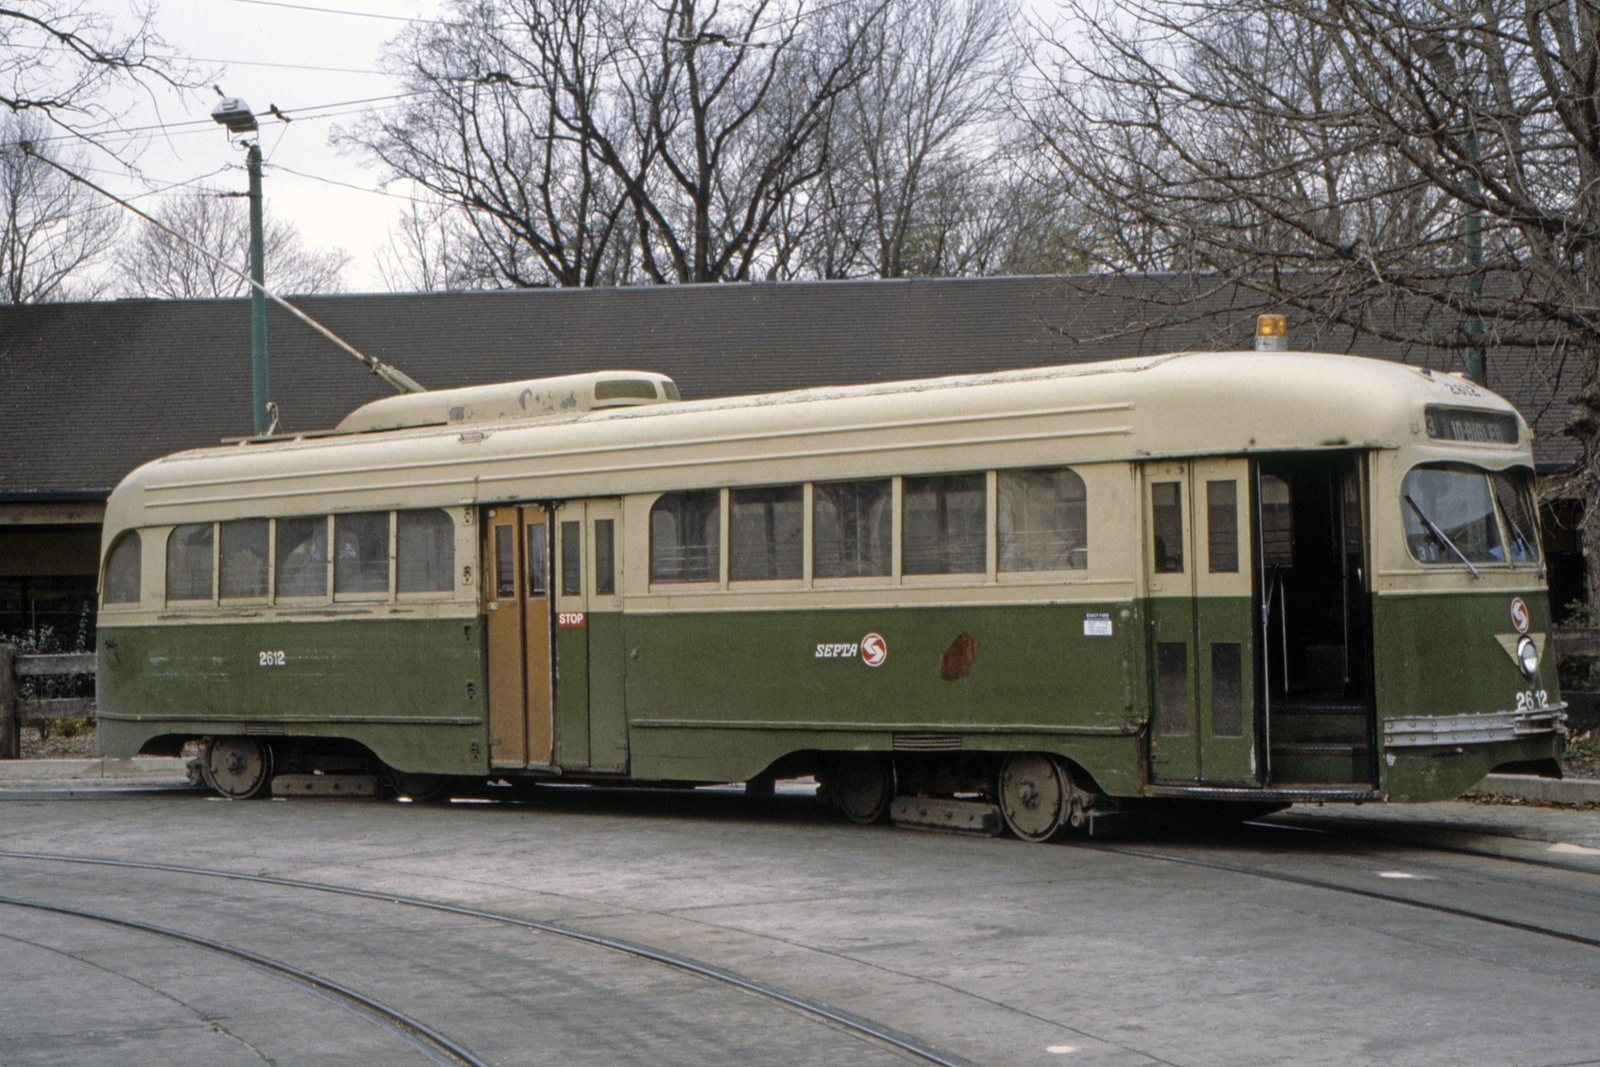 (934k, 1600x1067)<br><b>Country:</b> United States<br><b>City:</b> Philadelphia, PA<br><b>System:</b> SEPTA (or Predecessor)<br><b>Line:</b> Rt. 23-Germantown<br><b>Location:</b> Bethlehem Pike/Chestnut Hill Loop<br><b>Car:</b> PTC/SEPTA Wartime Air-car PCC (St.Louis, 1942) 2612 <br><b>Collection of:</b> David Pirmann<br><b>Date:</b> 3/1985<br><b>Viewed (this week/total):</b> 2 / 90